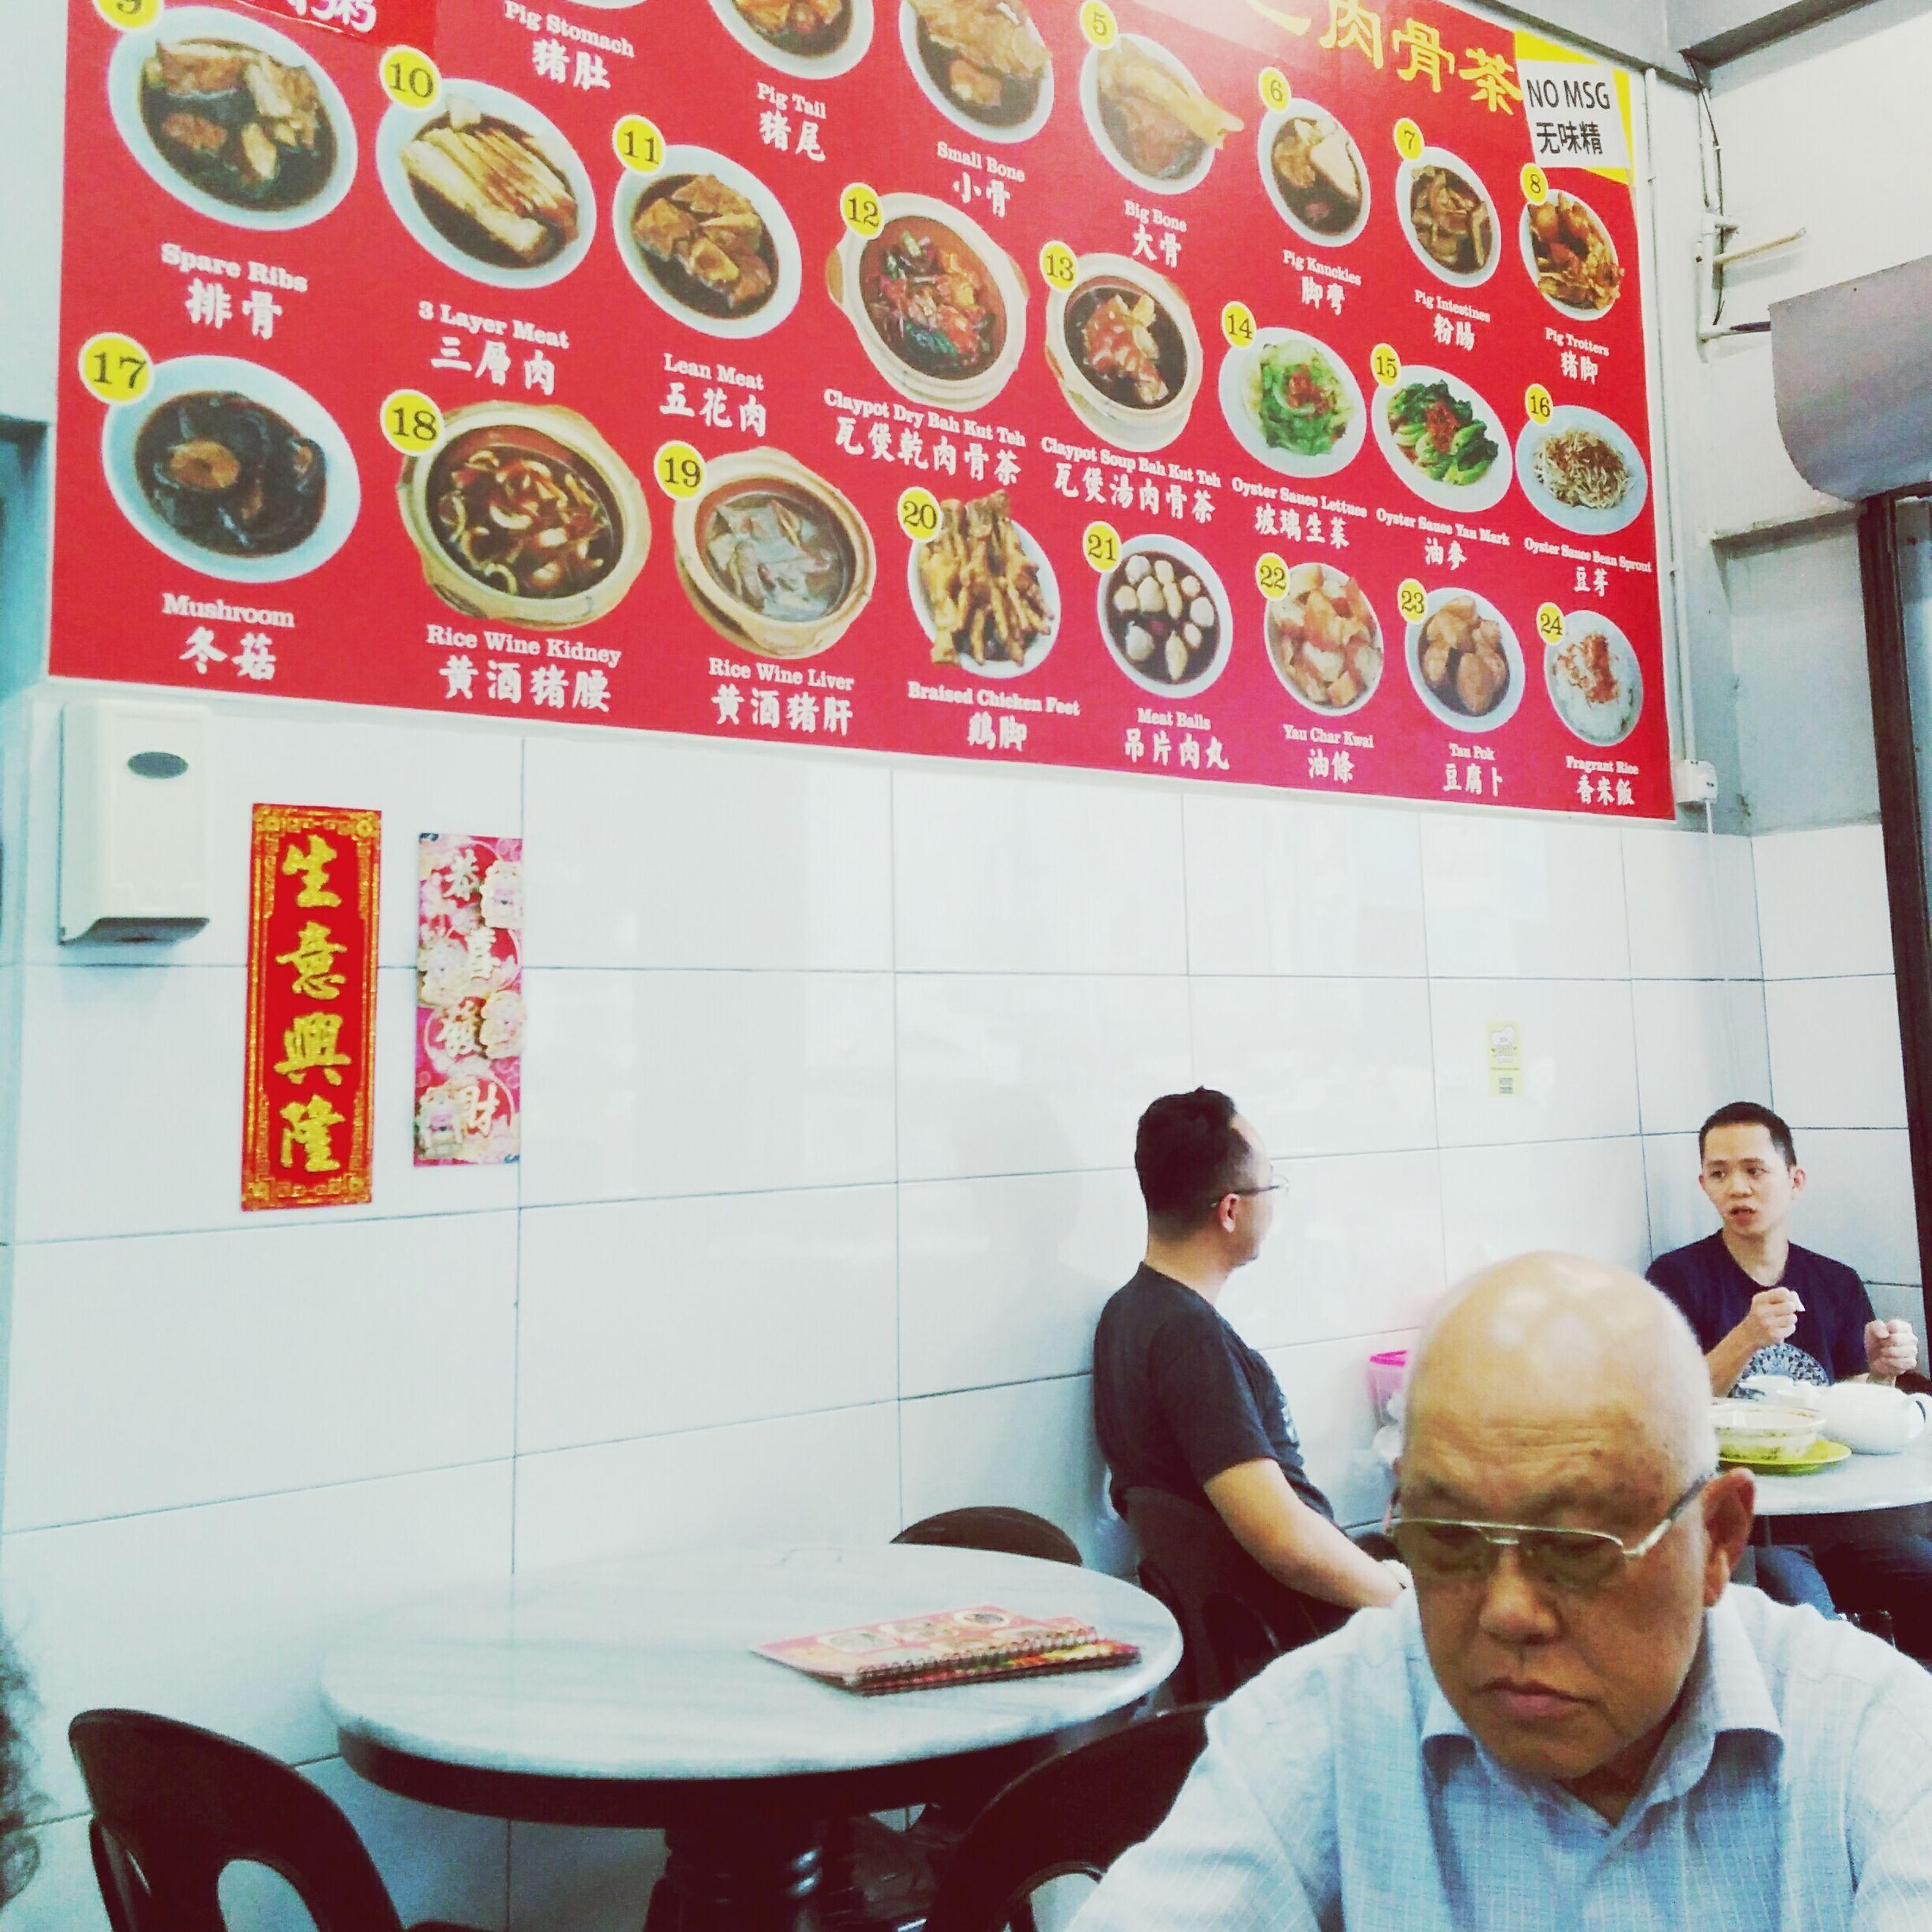 indoors, food, real people, men, day, people